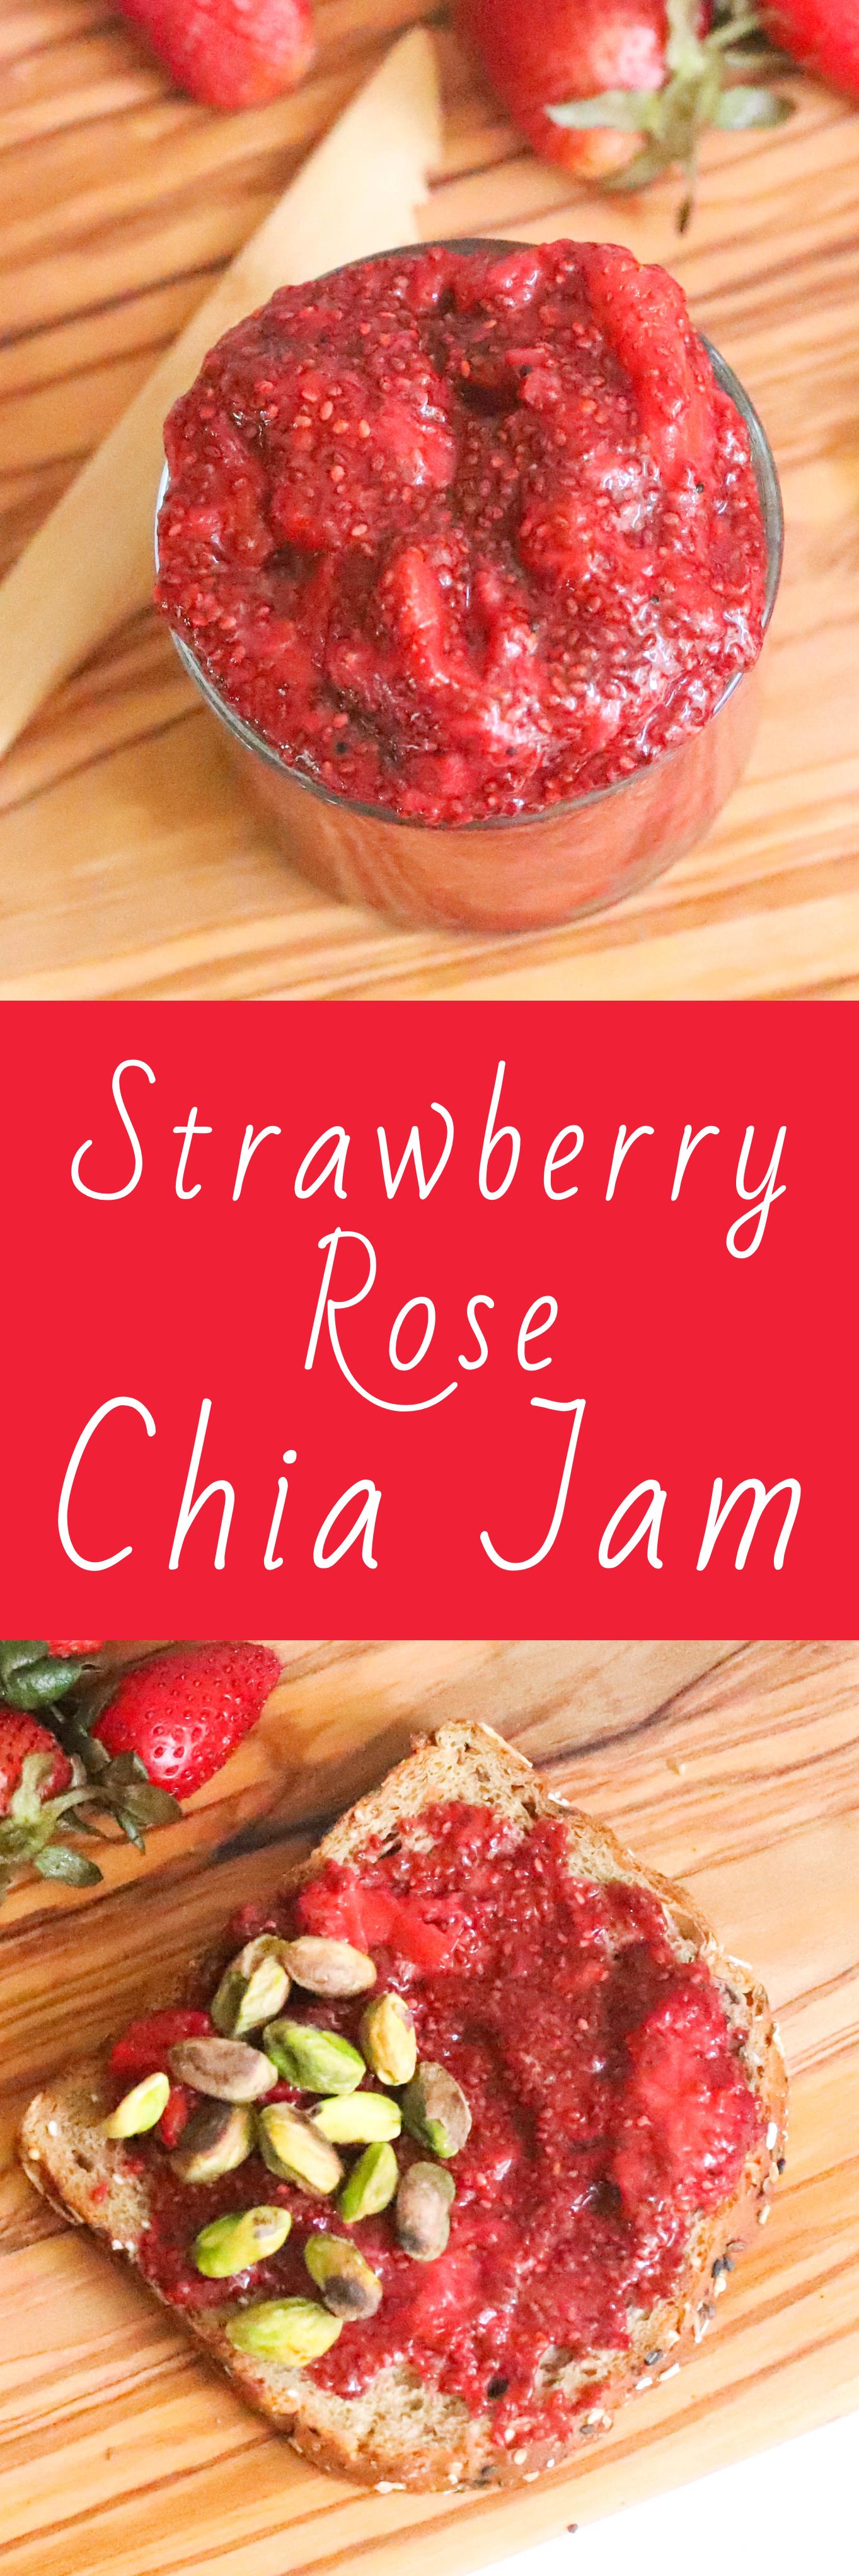 Strawberry Rose Chia Jam